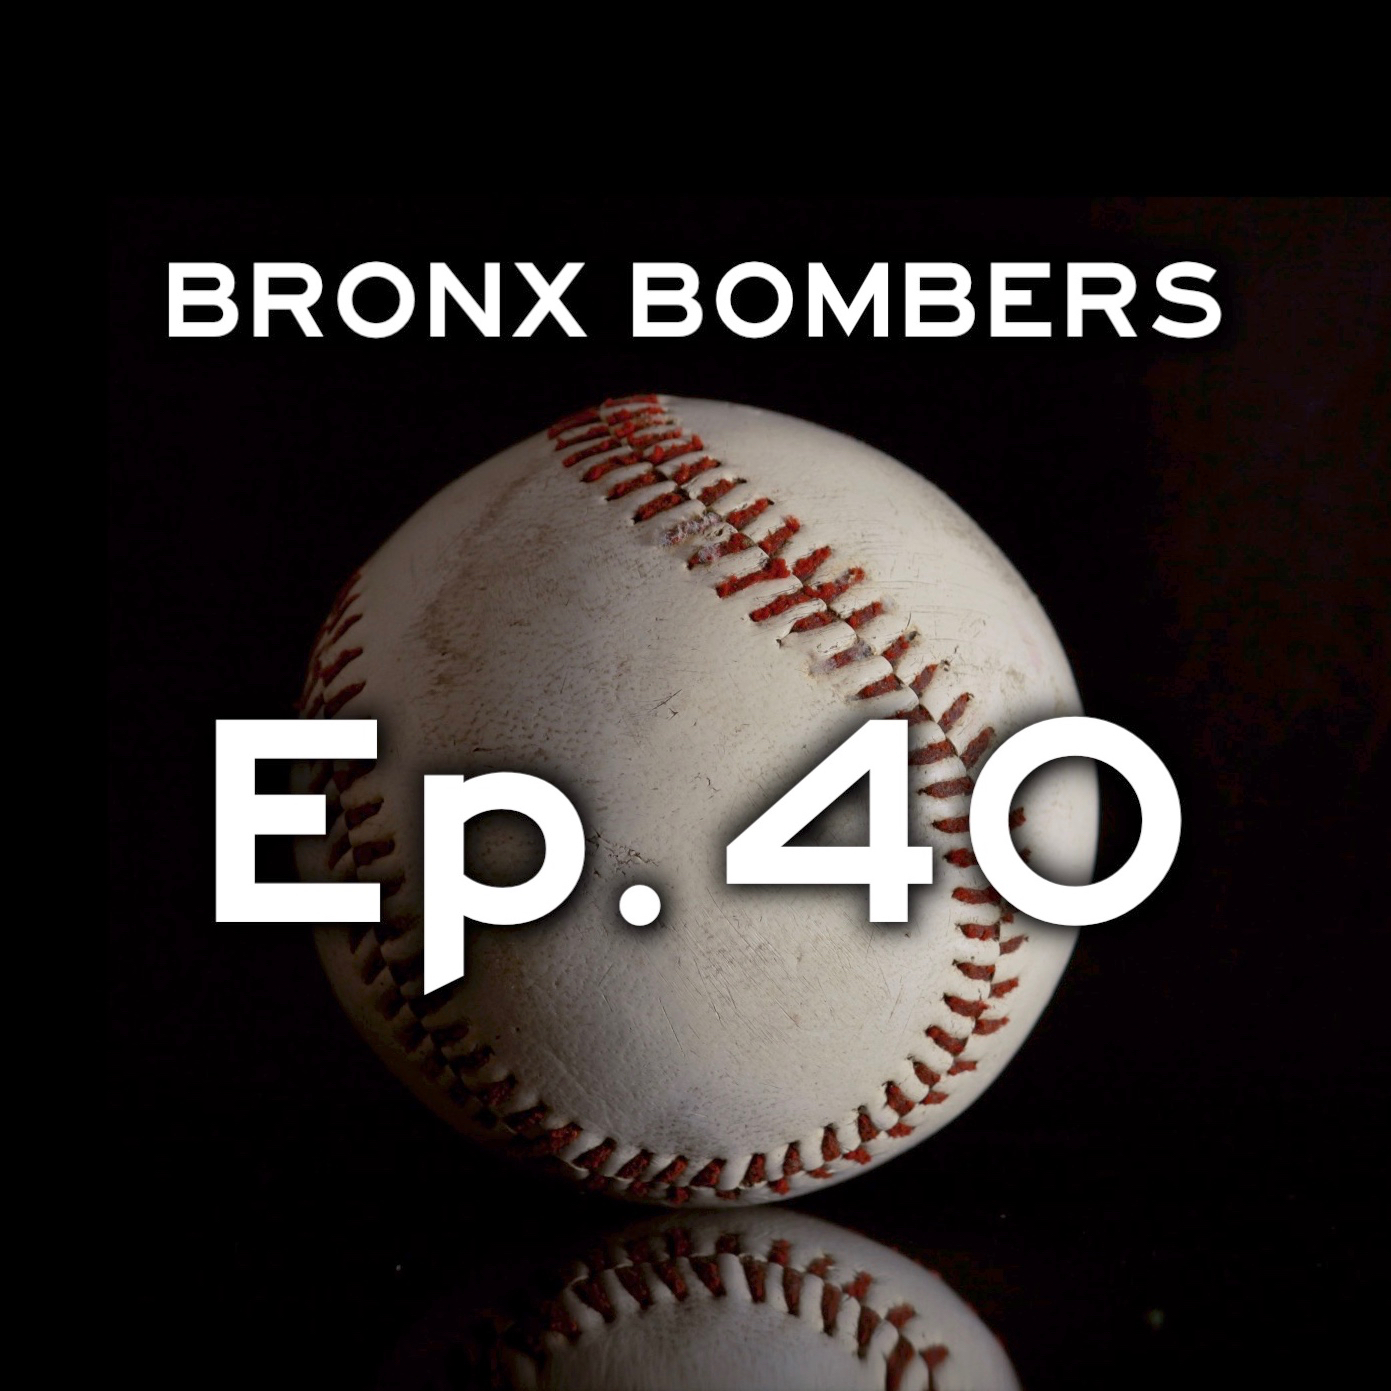 Bronx Bombers - New York Yankees Podcast (unofficial) | Himalaya